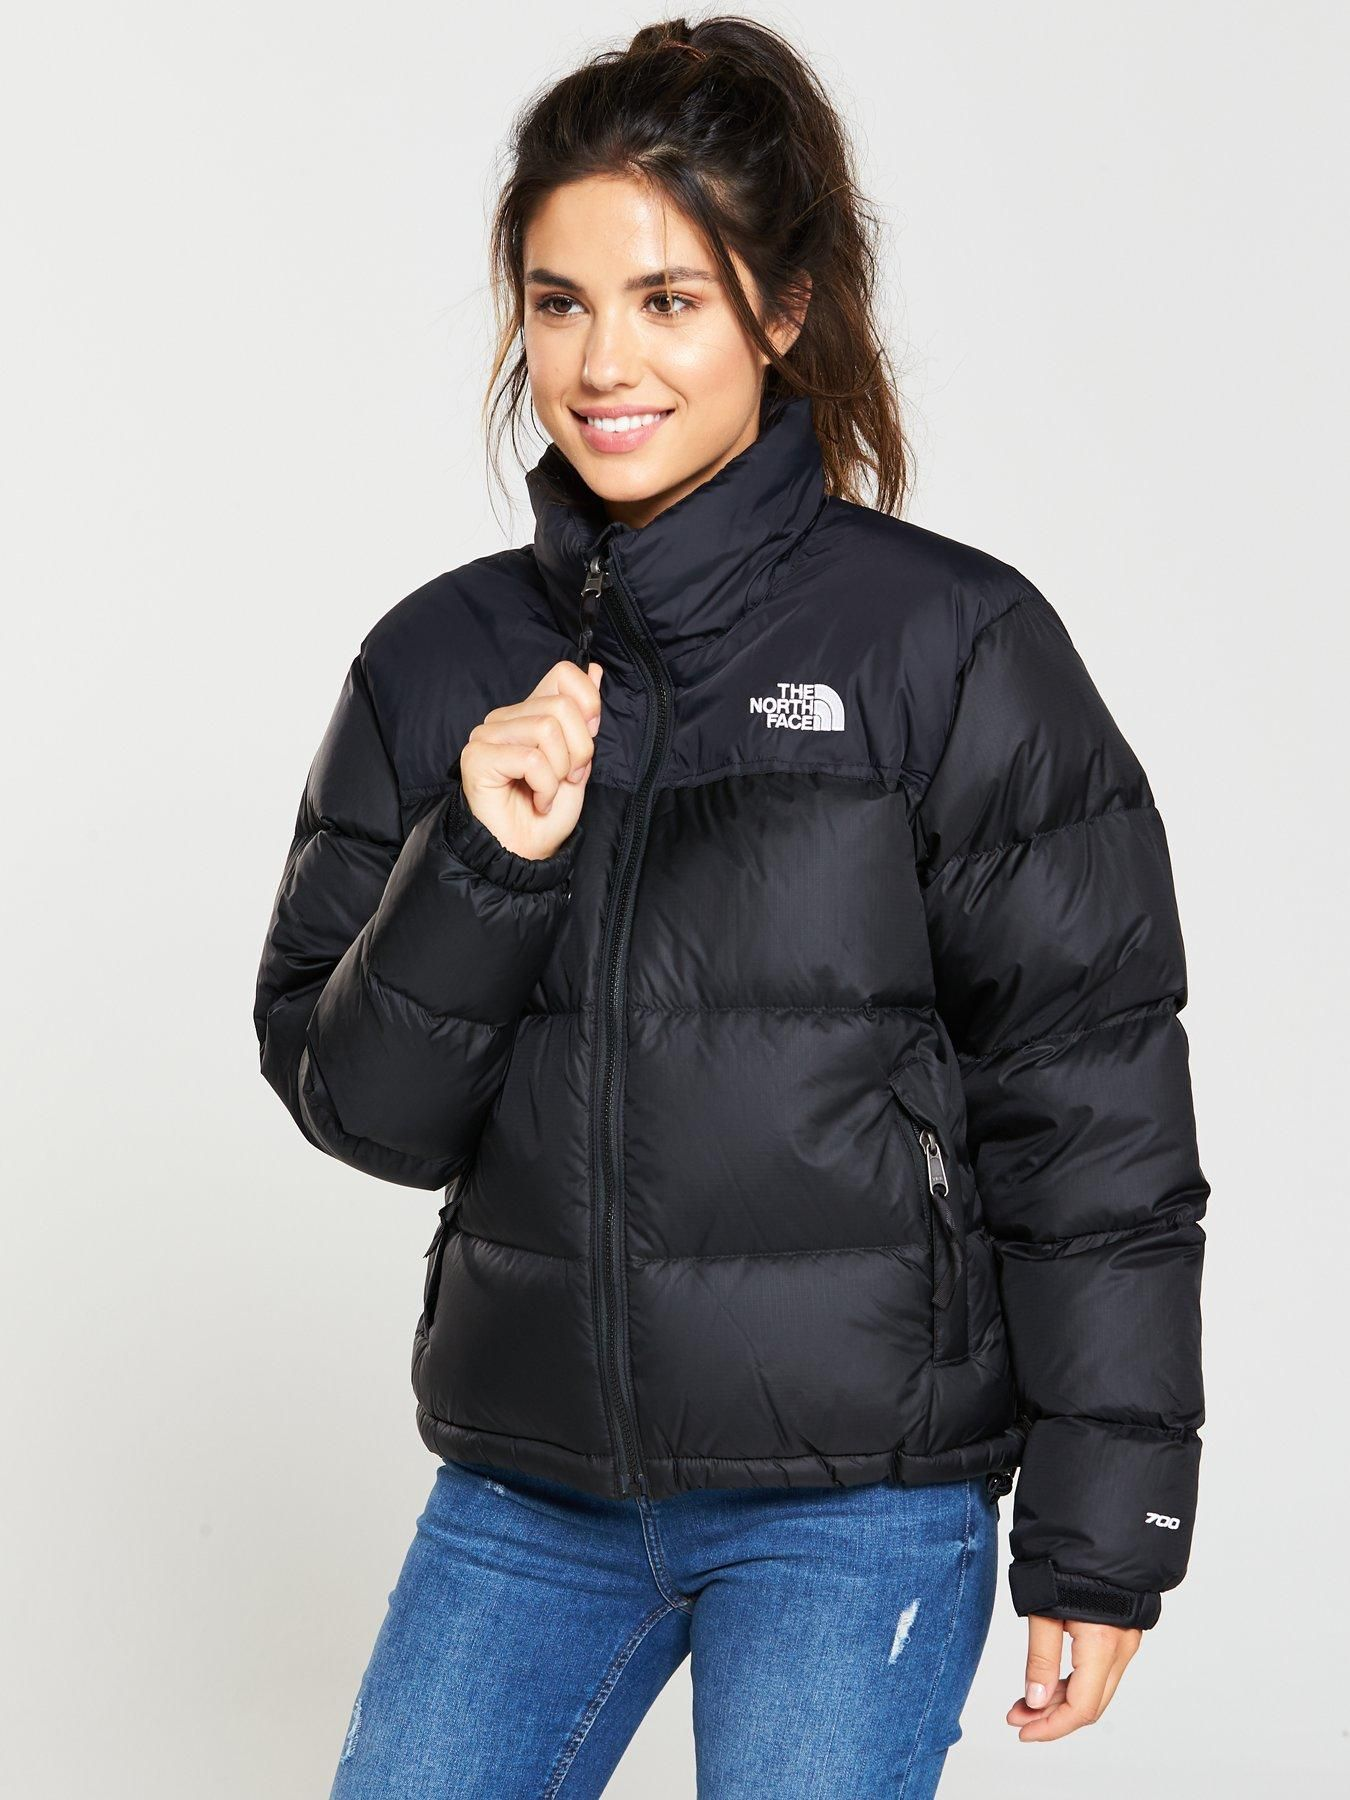 The North Face Tnf 1996 Retro Nuptse Jacket in Black